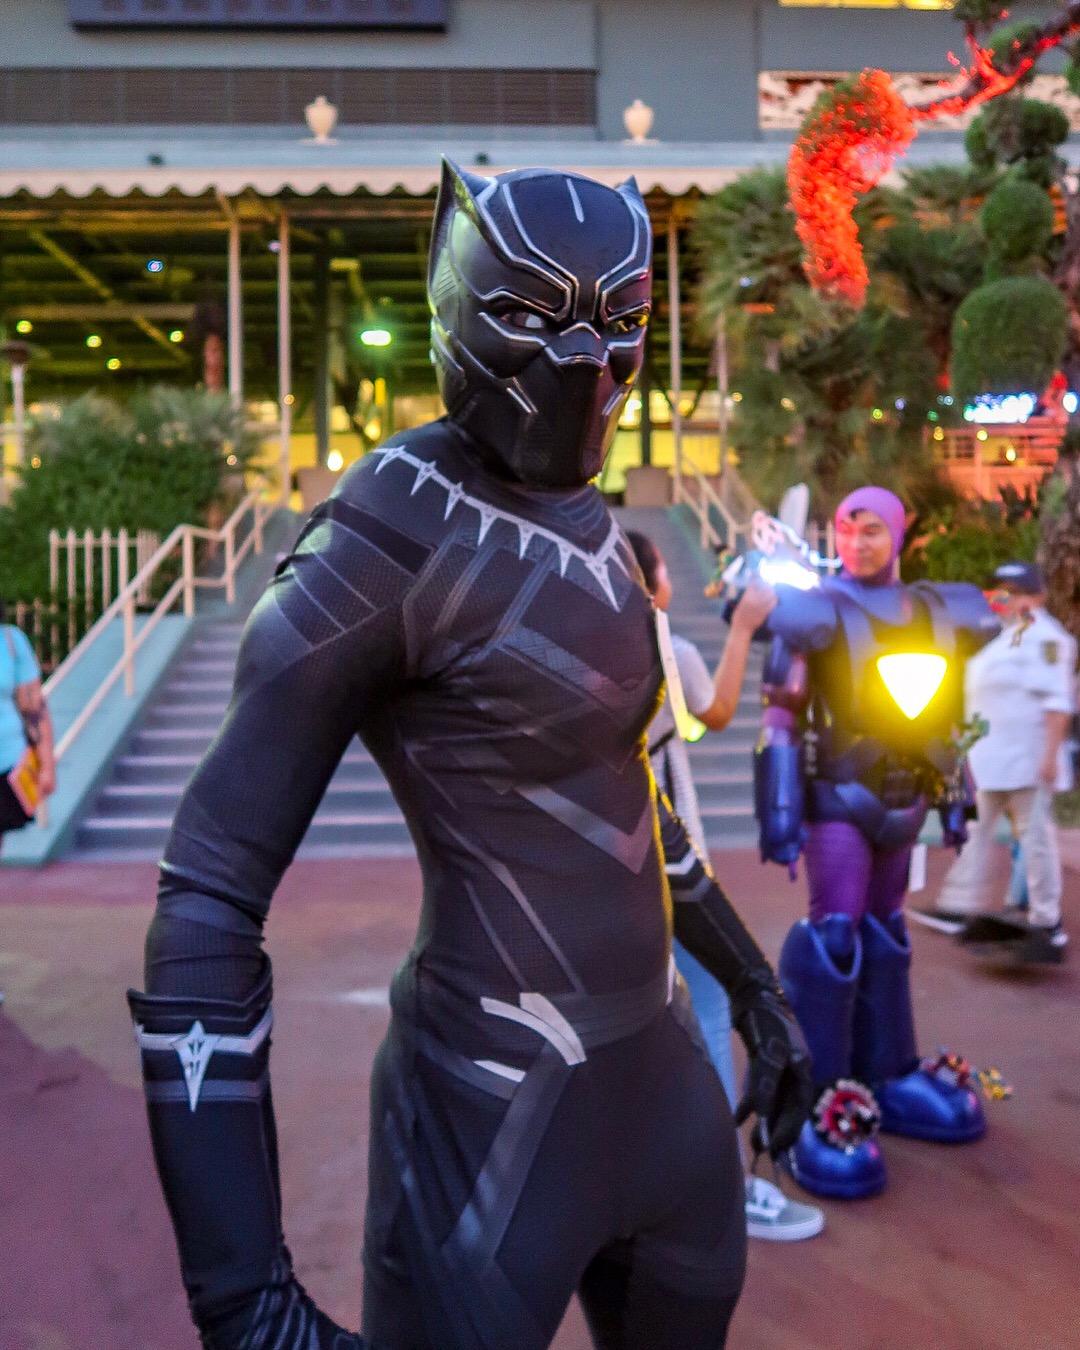 626-night-market-cosplay-contest-black-panther-2.JPG